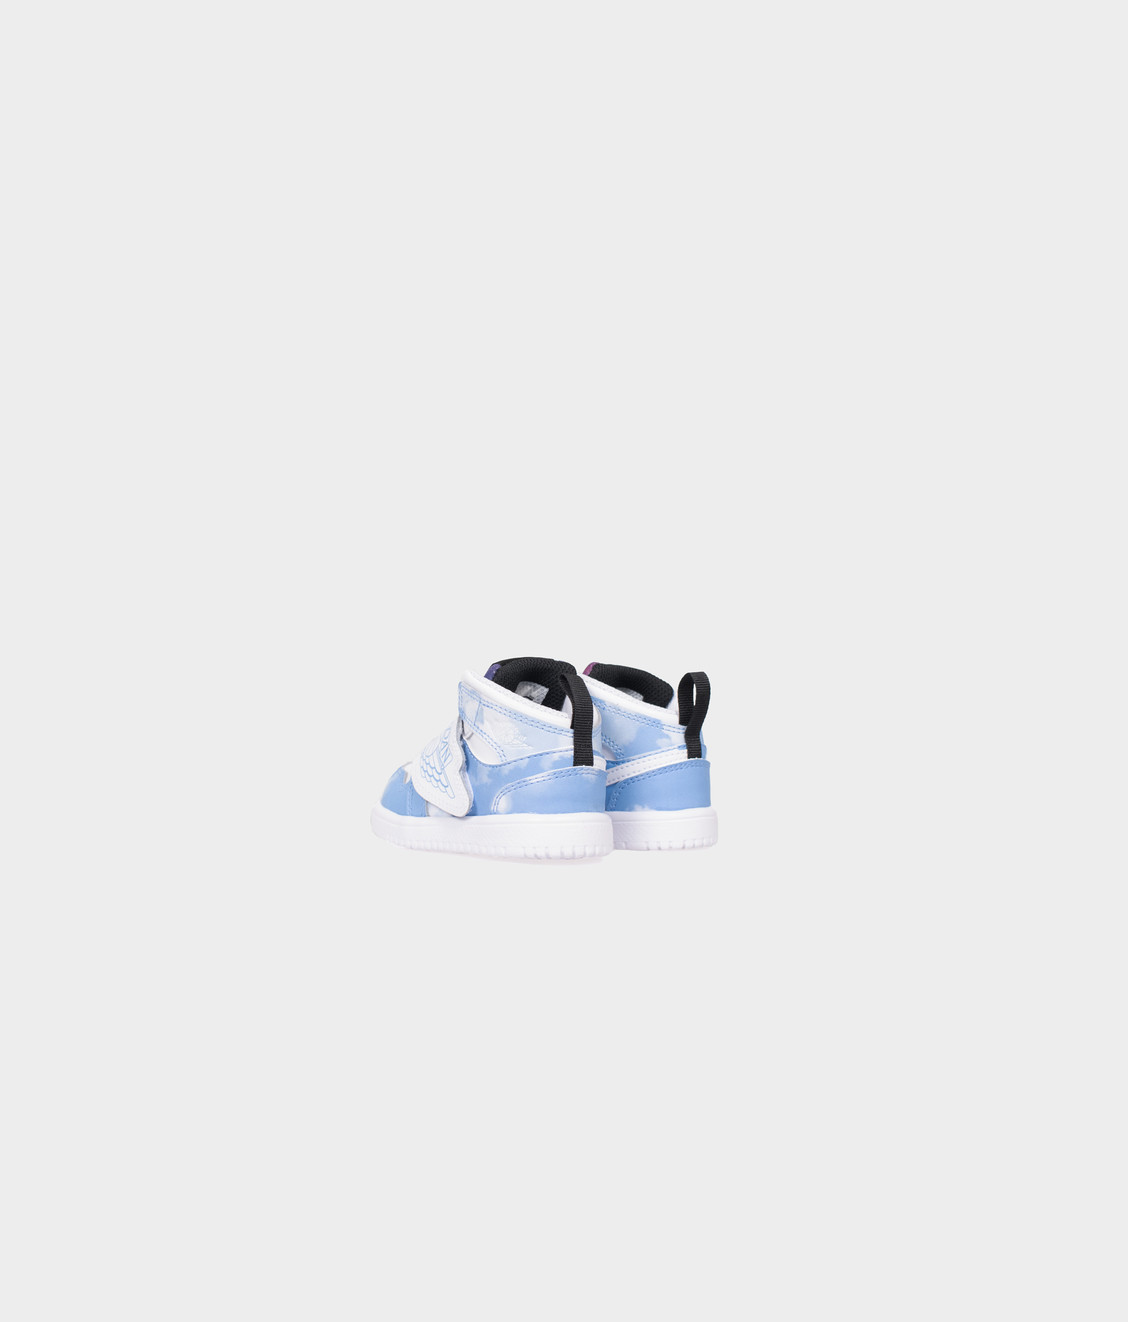 Nike Nike Sky Jordan 1 Fearless TD